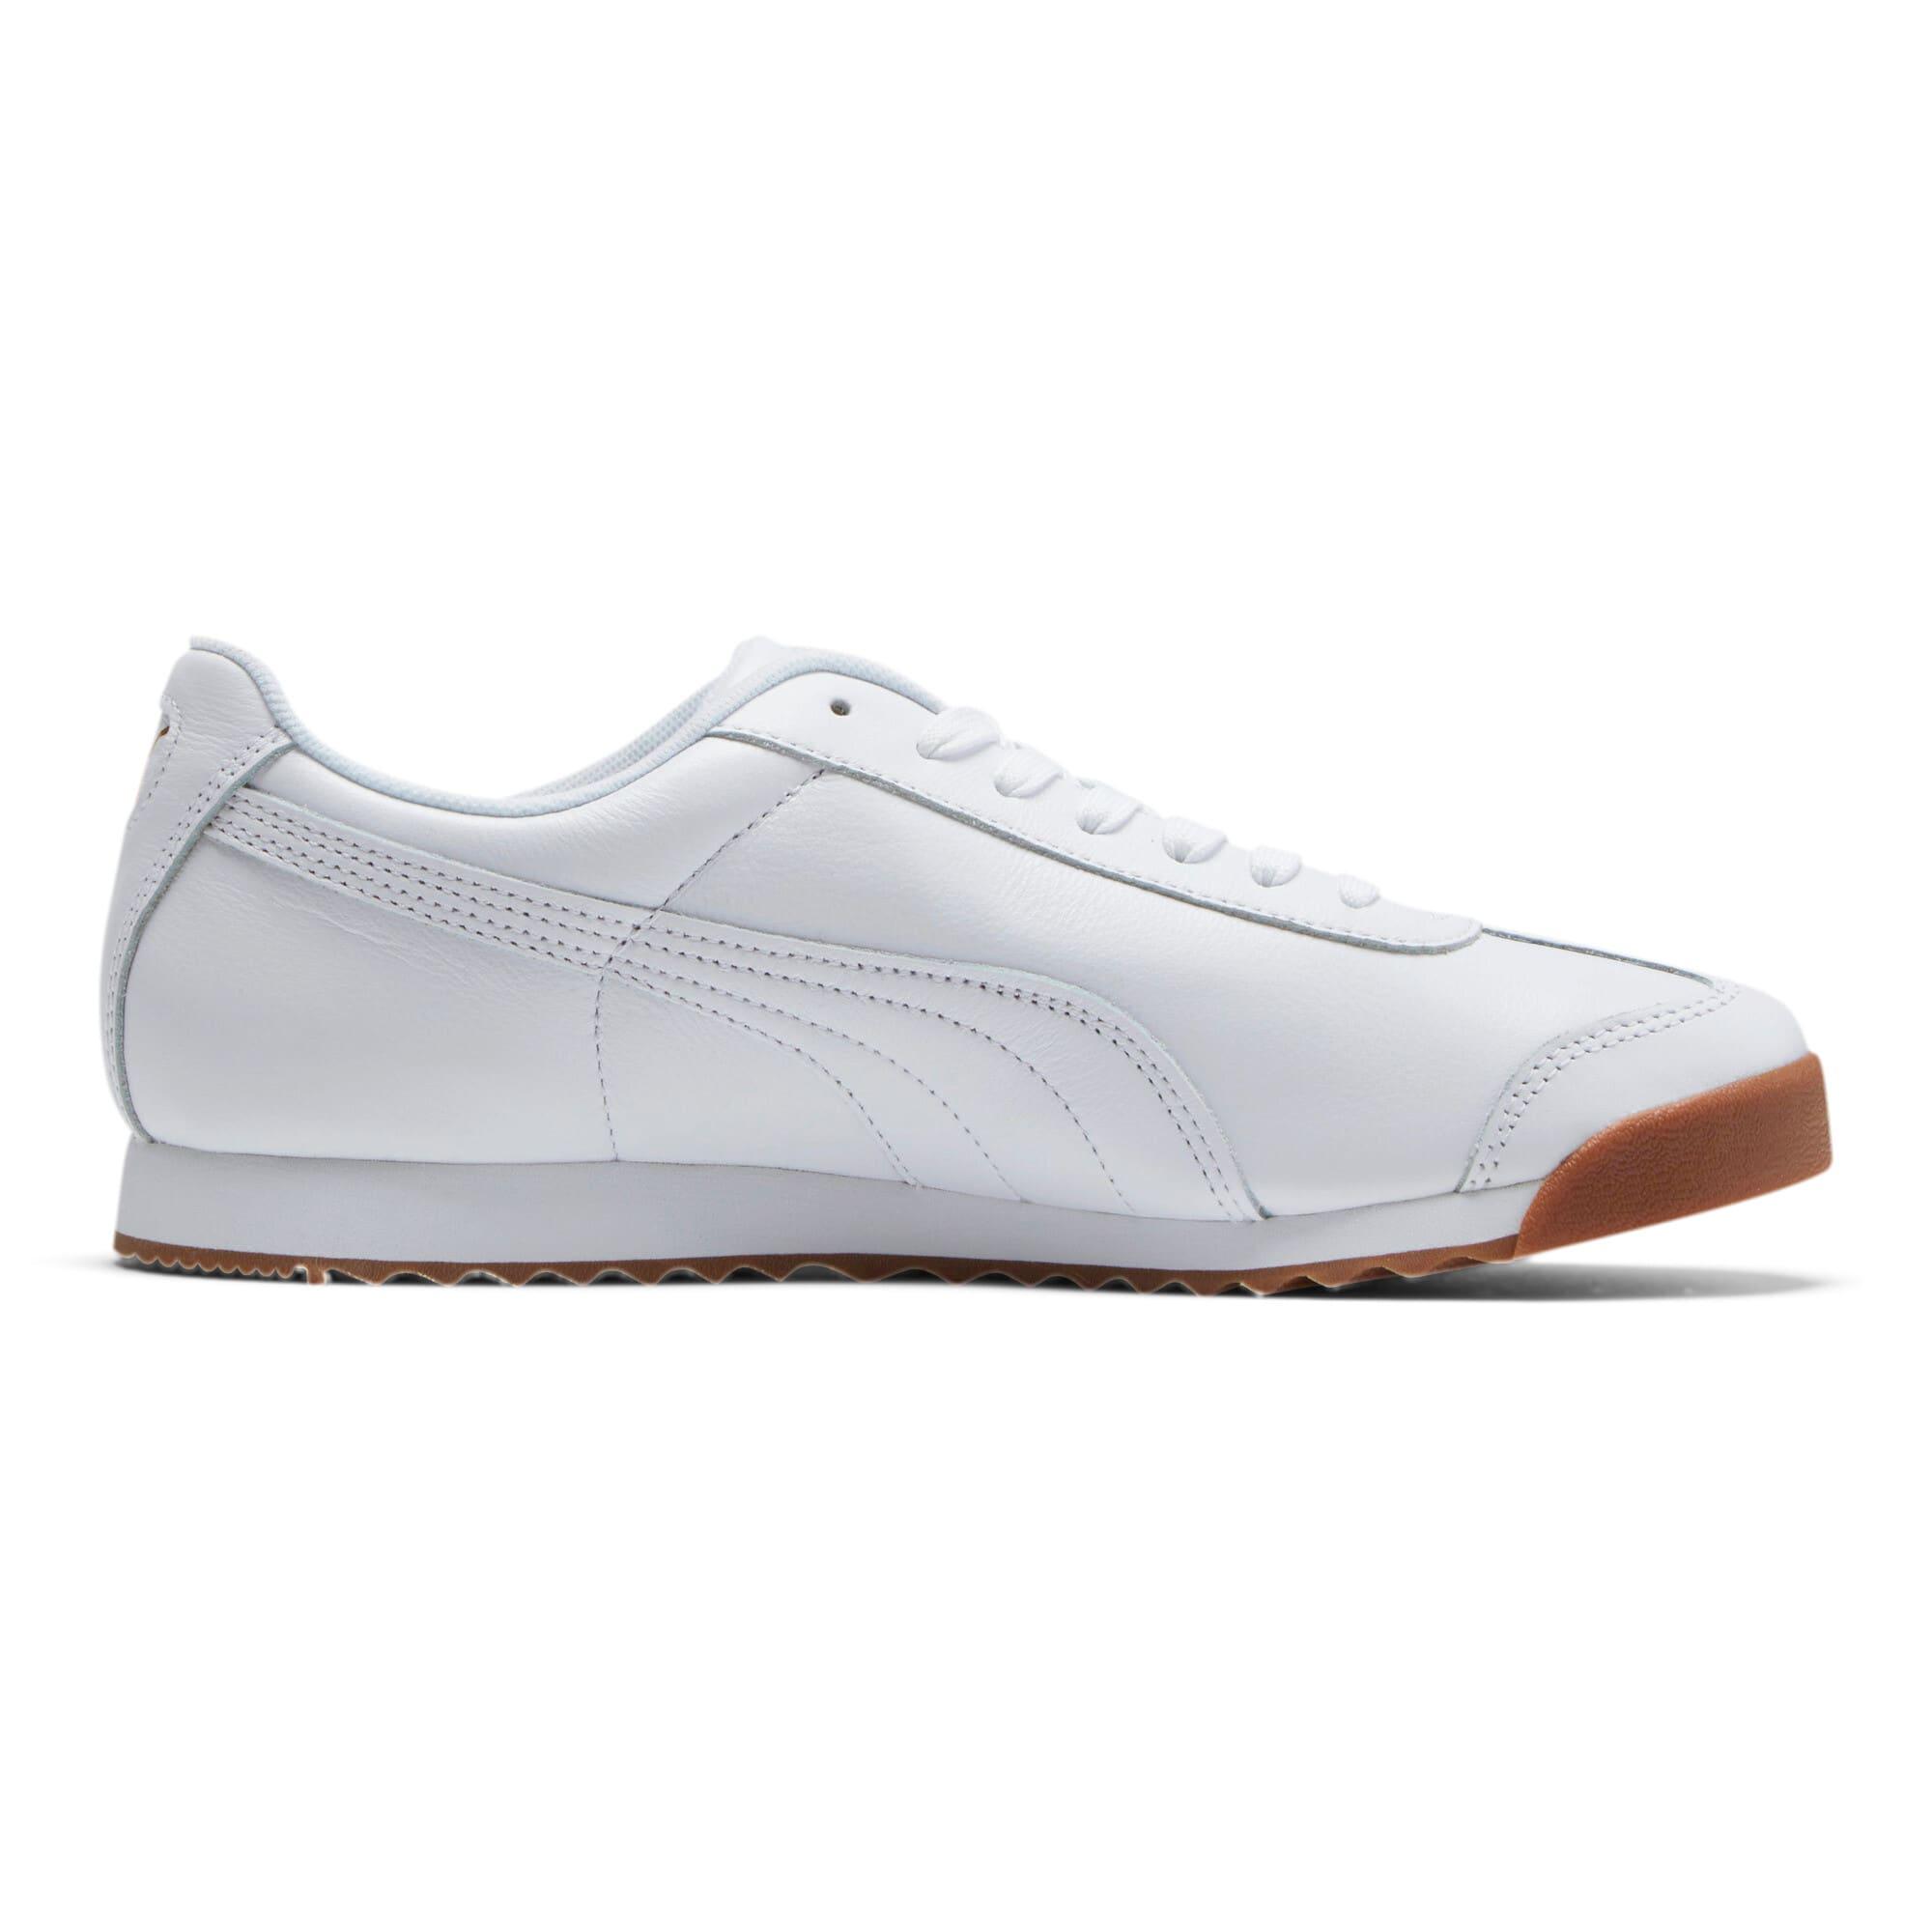 Thumbnail 5 of Roma Classic Gum Sneakers, Puma White-Puma Team Gold, medium